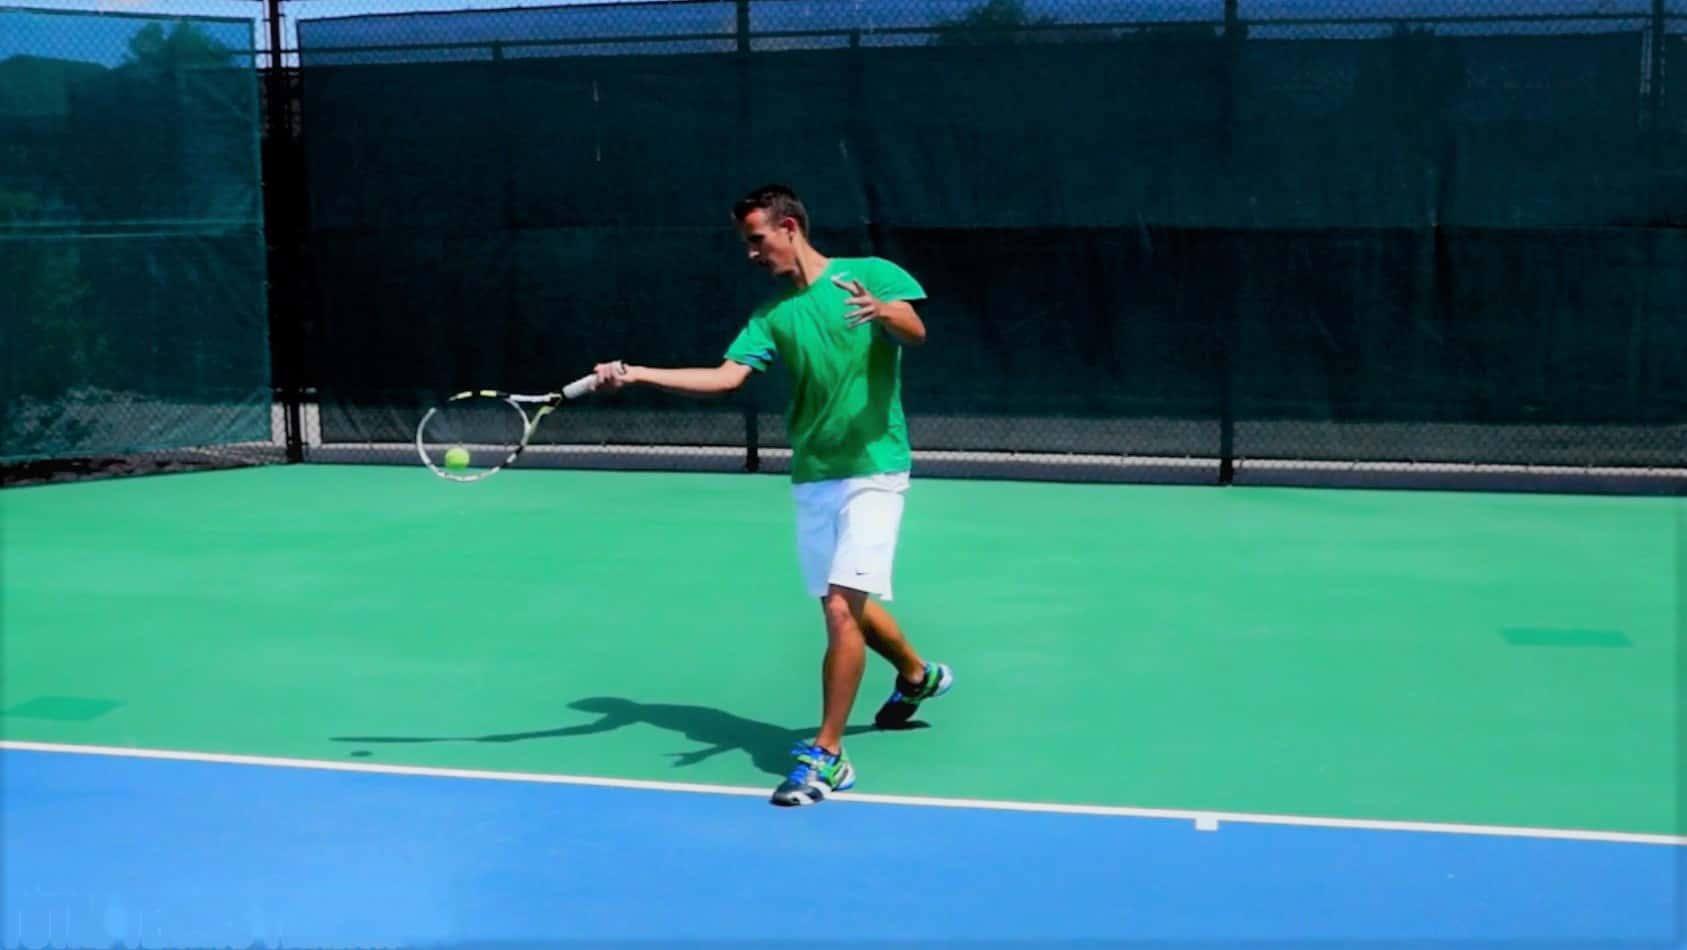 Tennis Forehand Technique Tip